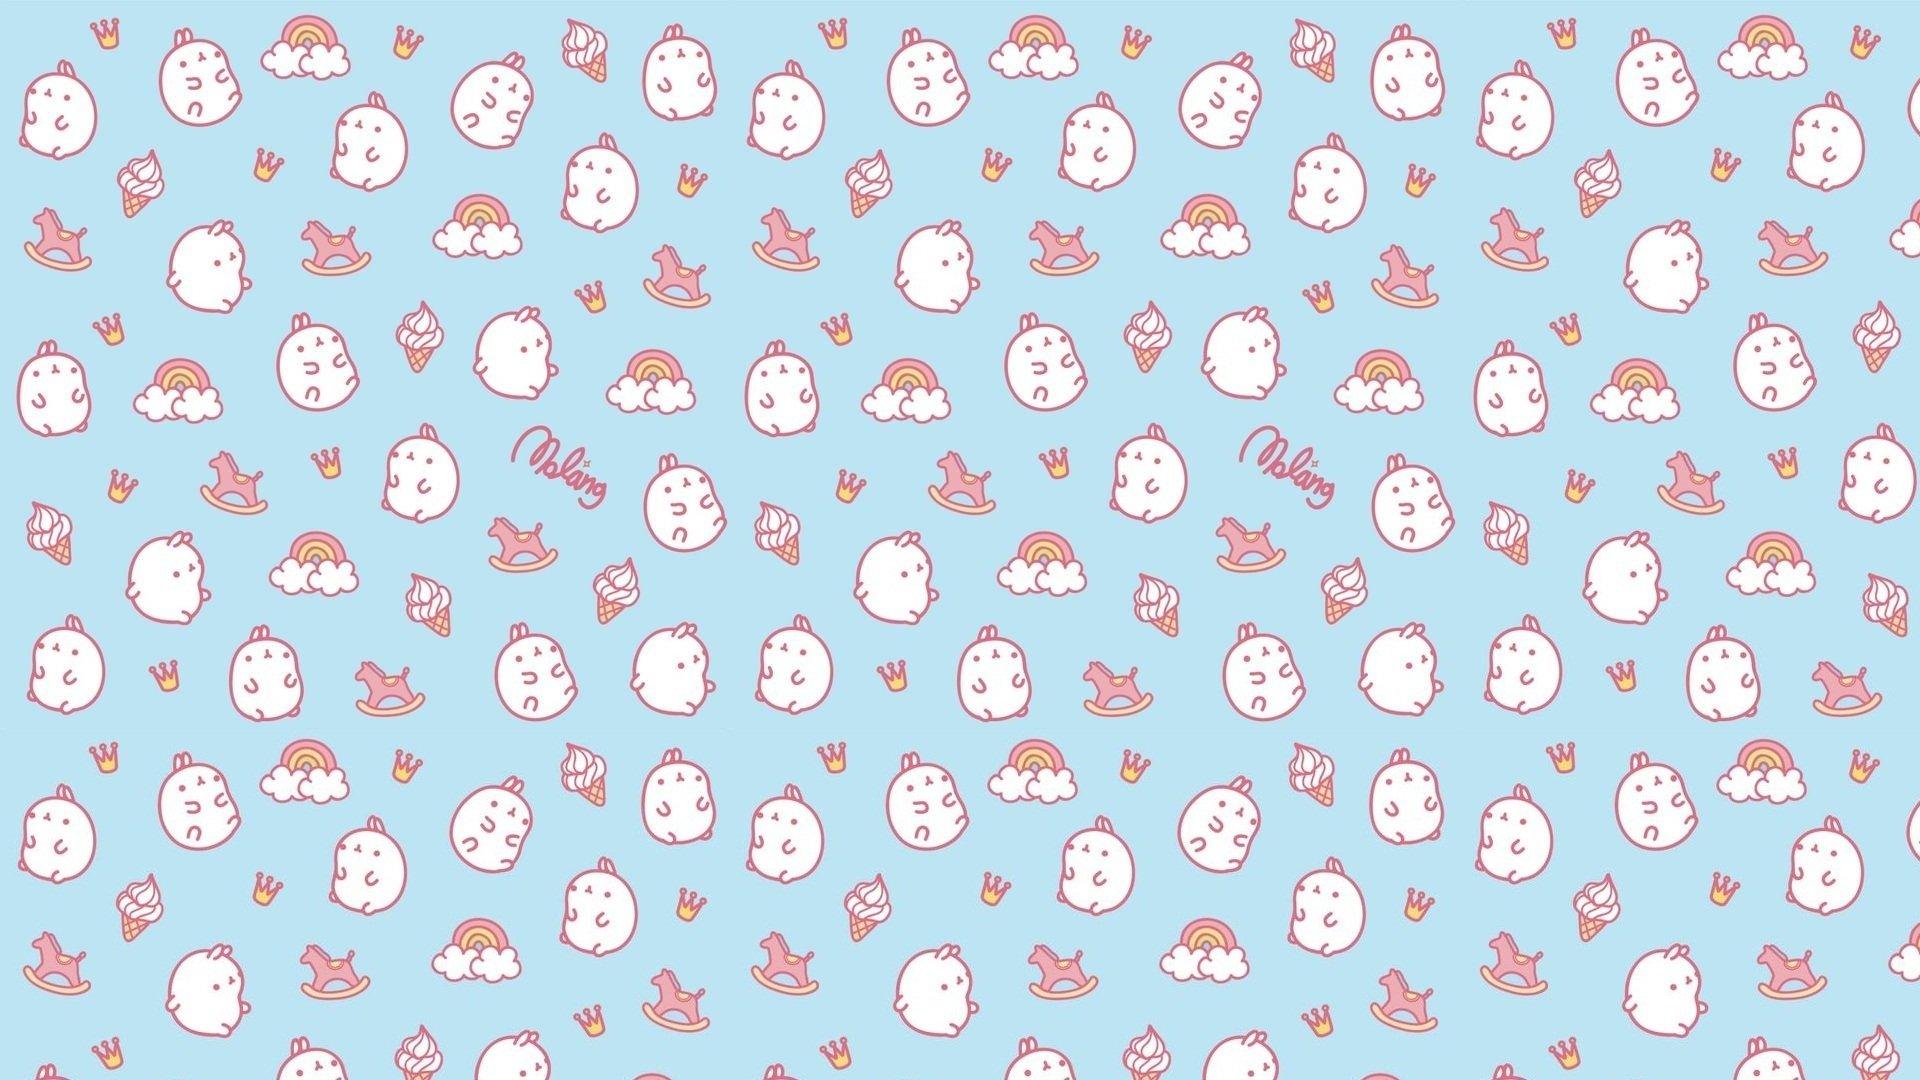 Pastel Kawaii Wallpaper HD